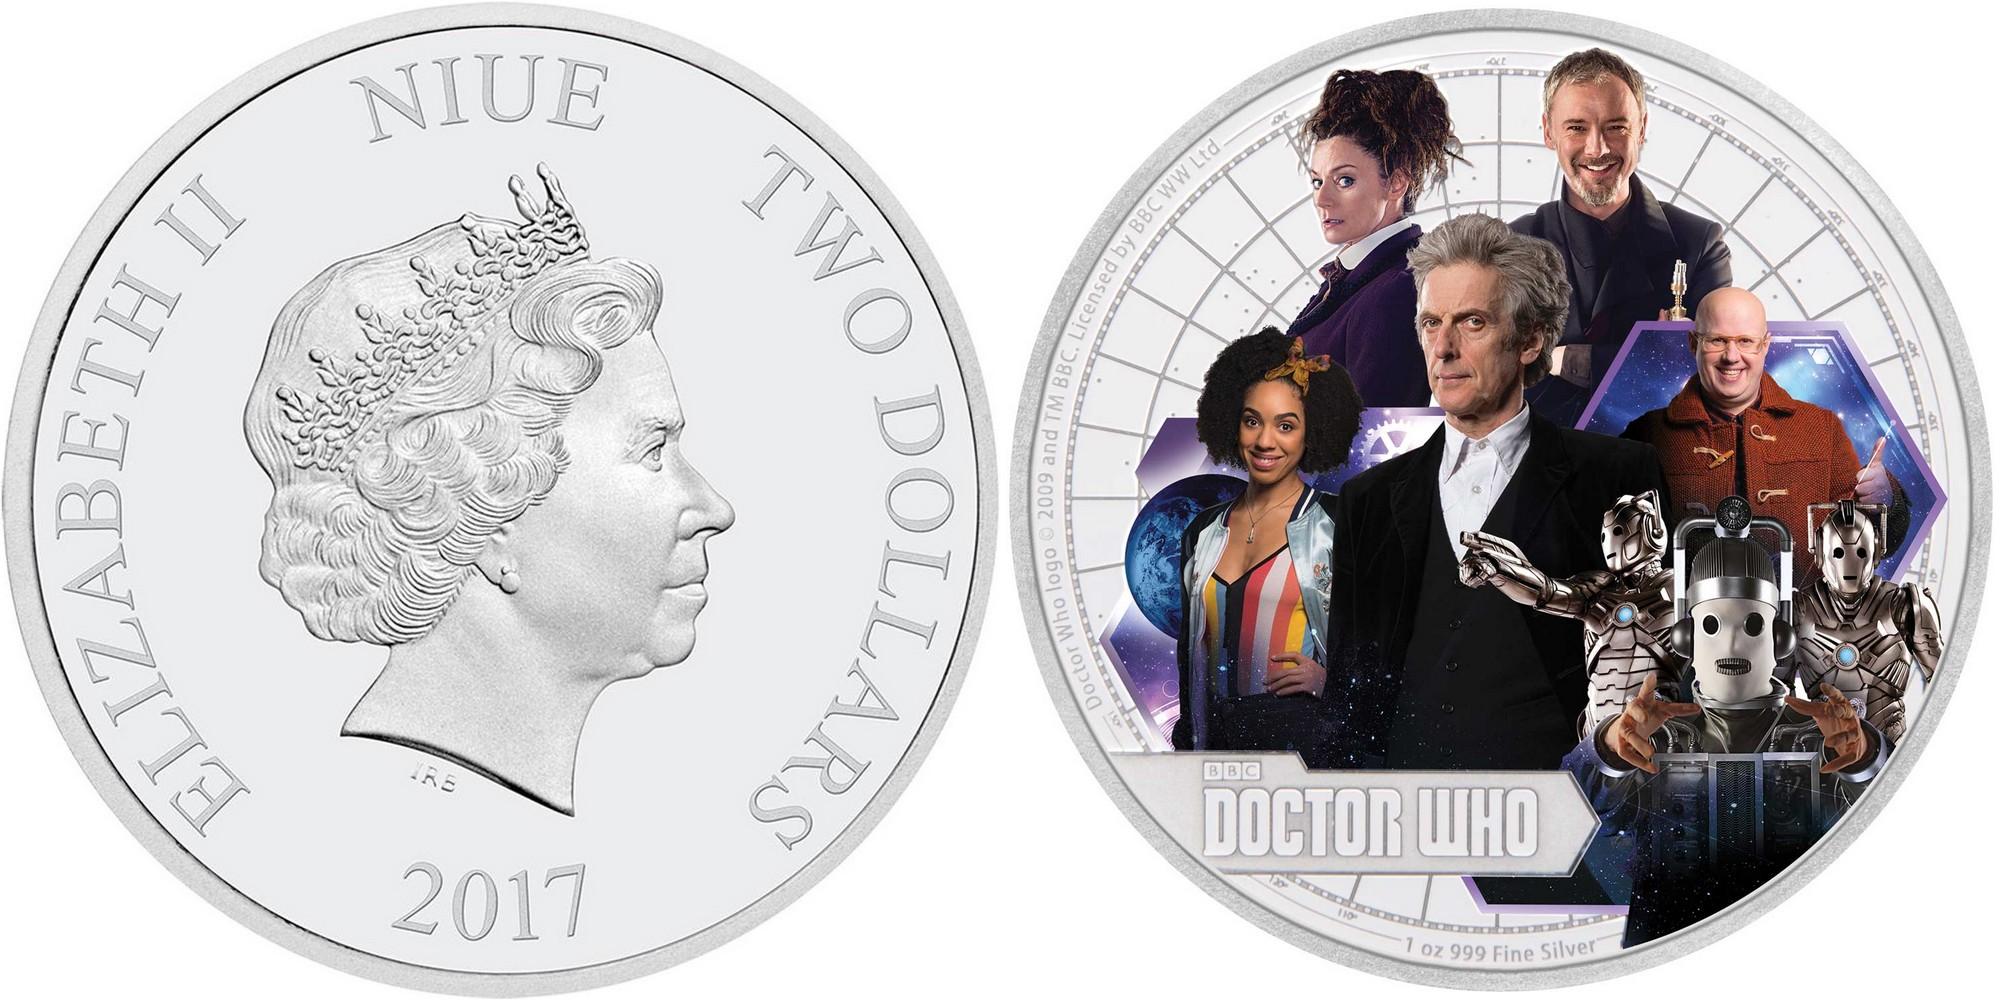 niue 2017 docteur who saison 10